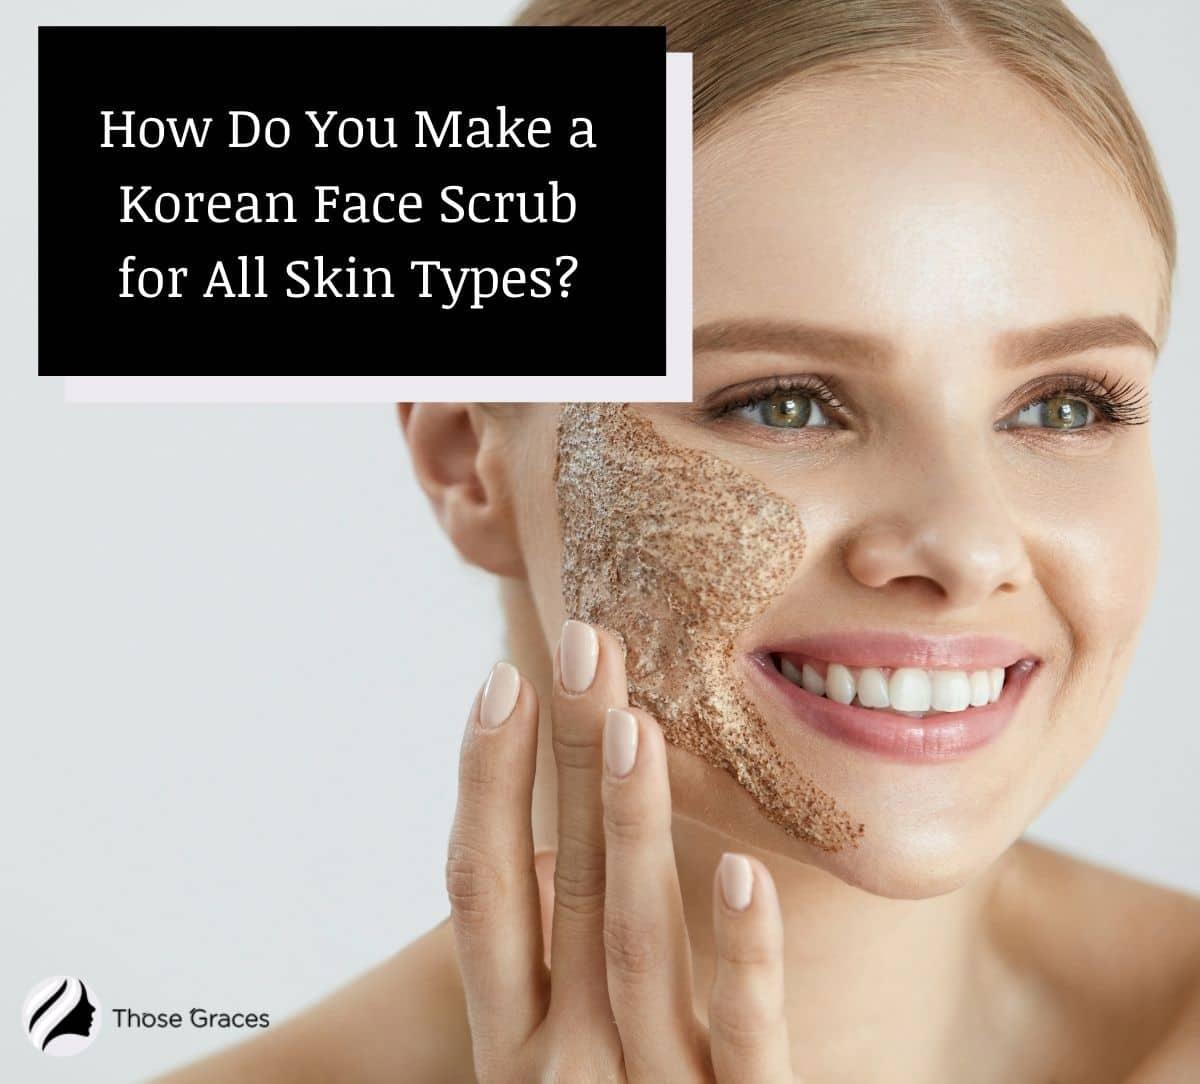 smiling woman with a DIY Korean face scrub